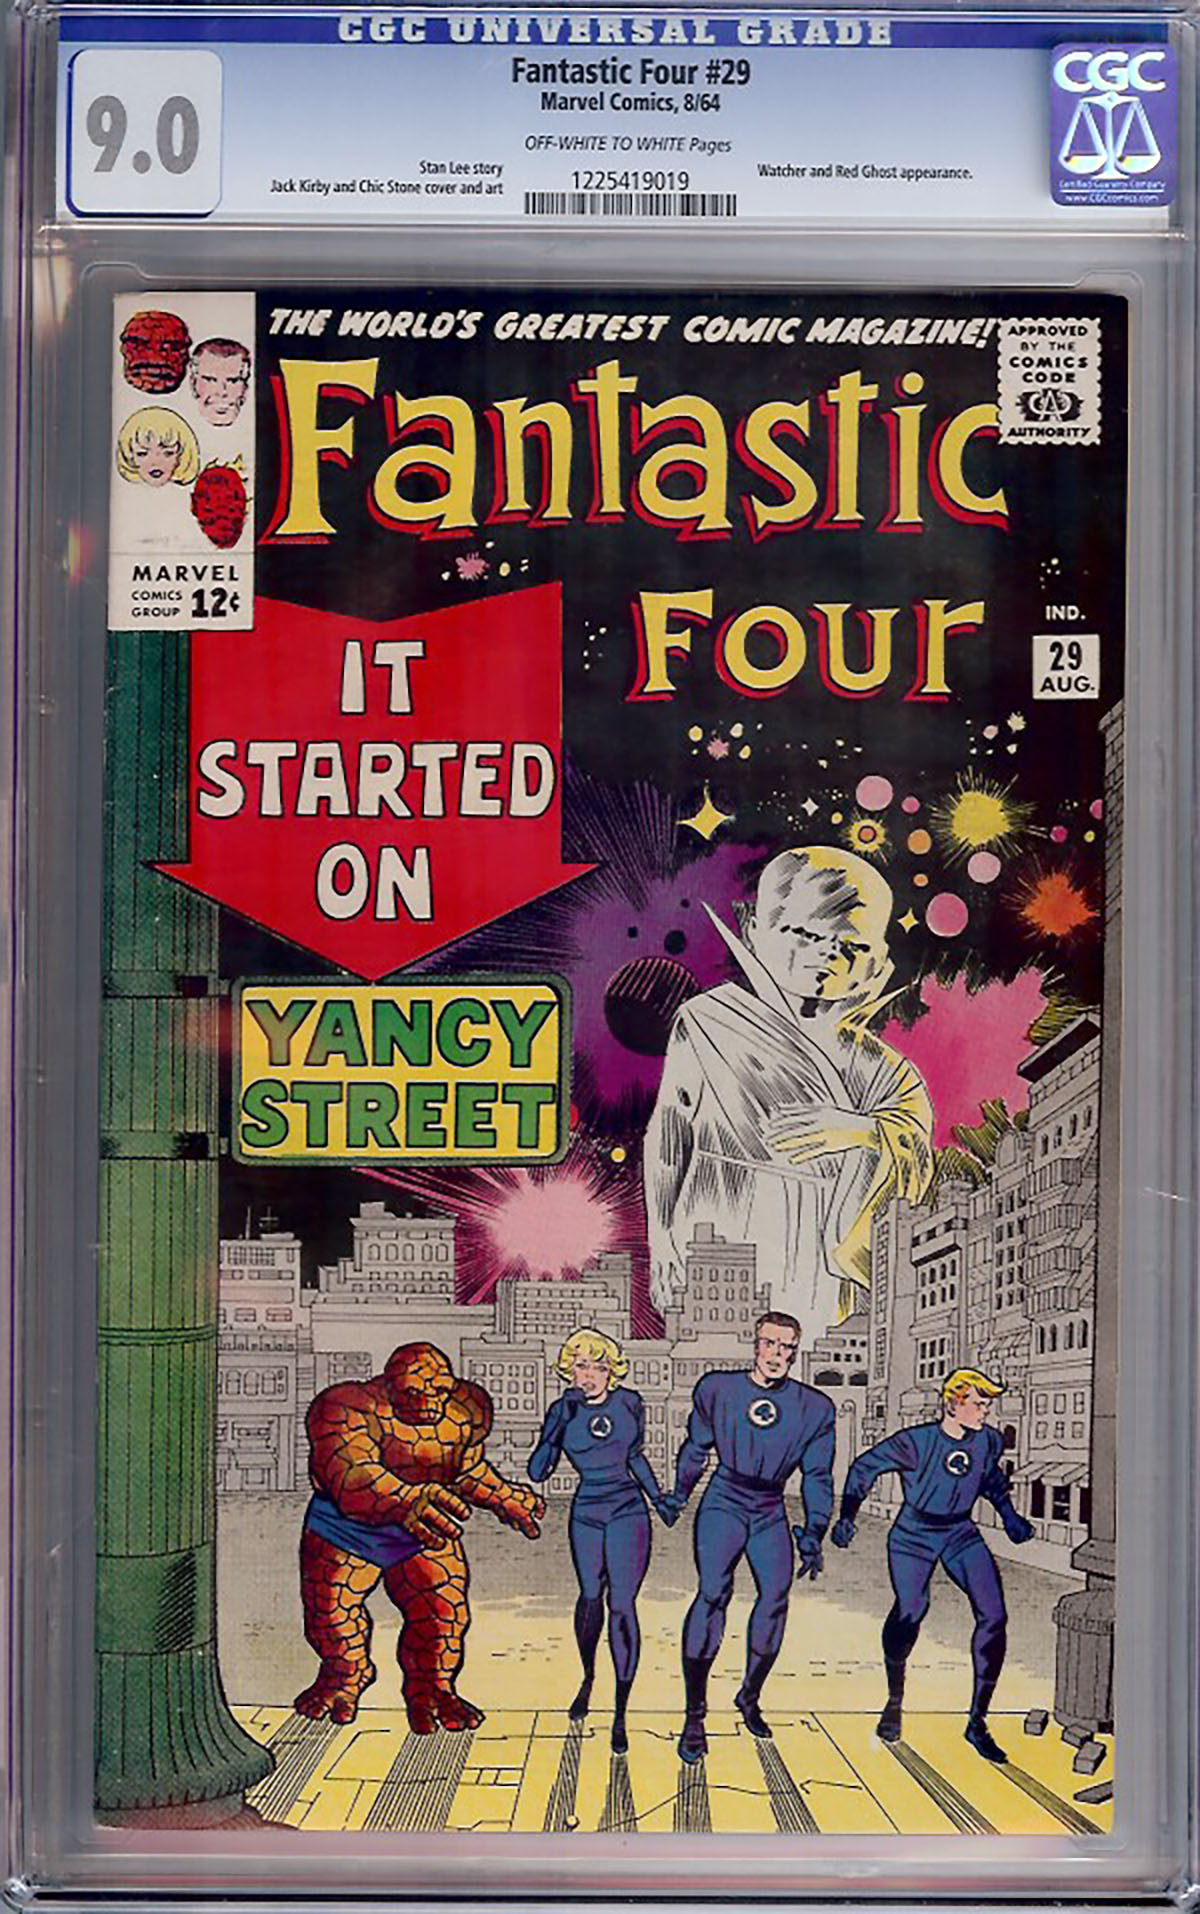 Fantastic Four #29 CGC 9.0 ow/w